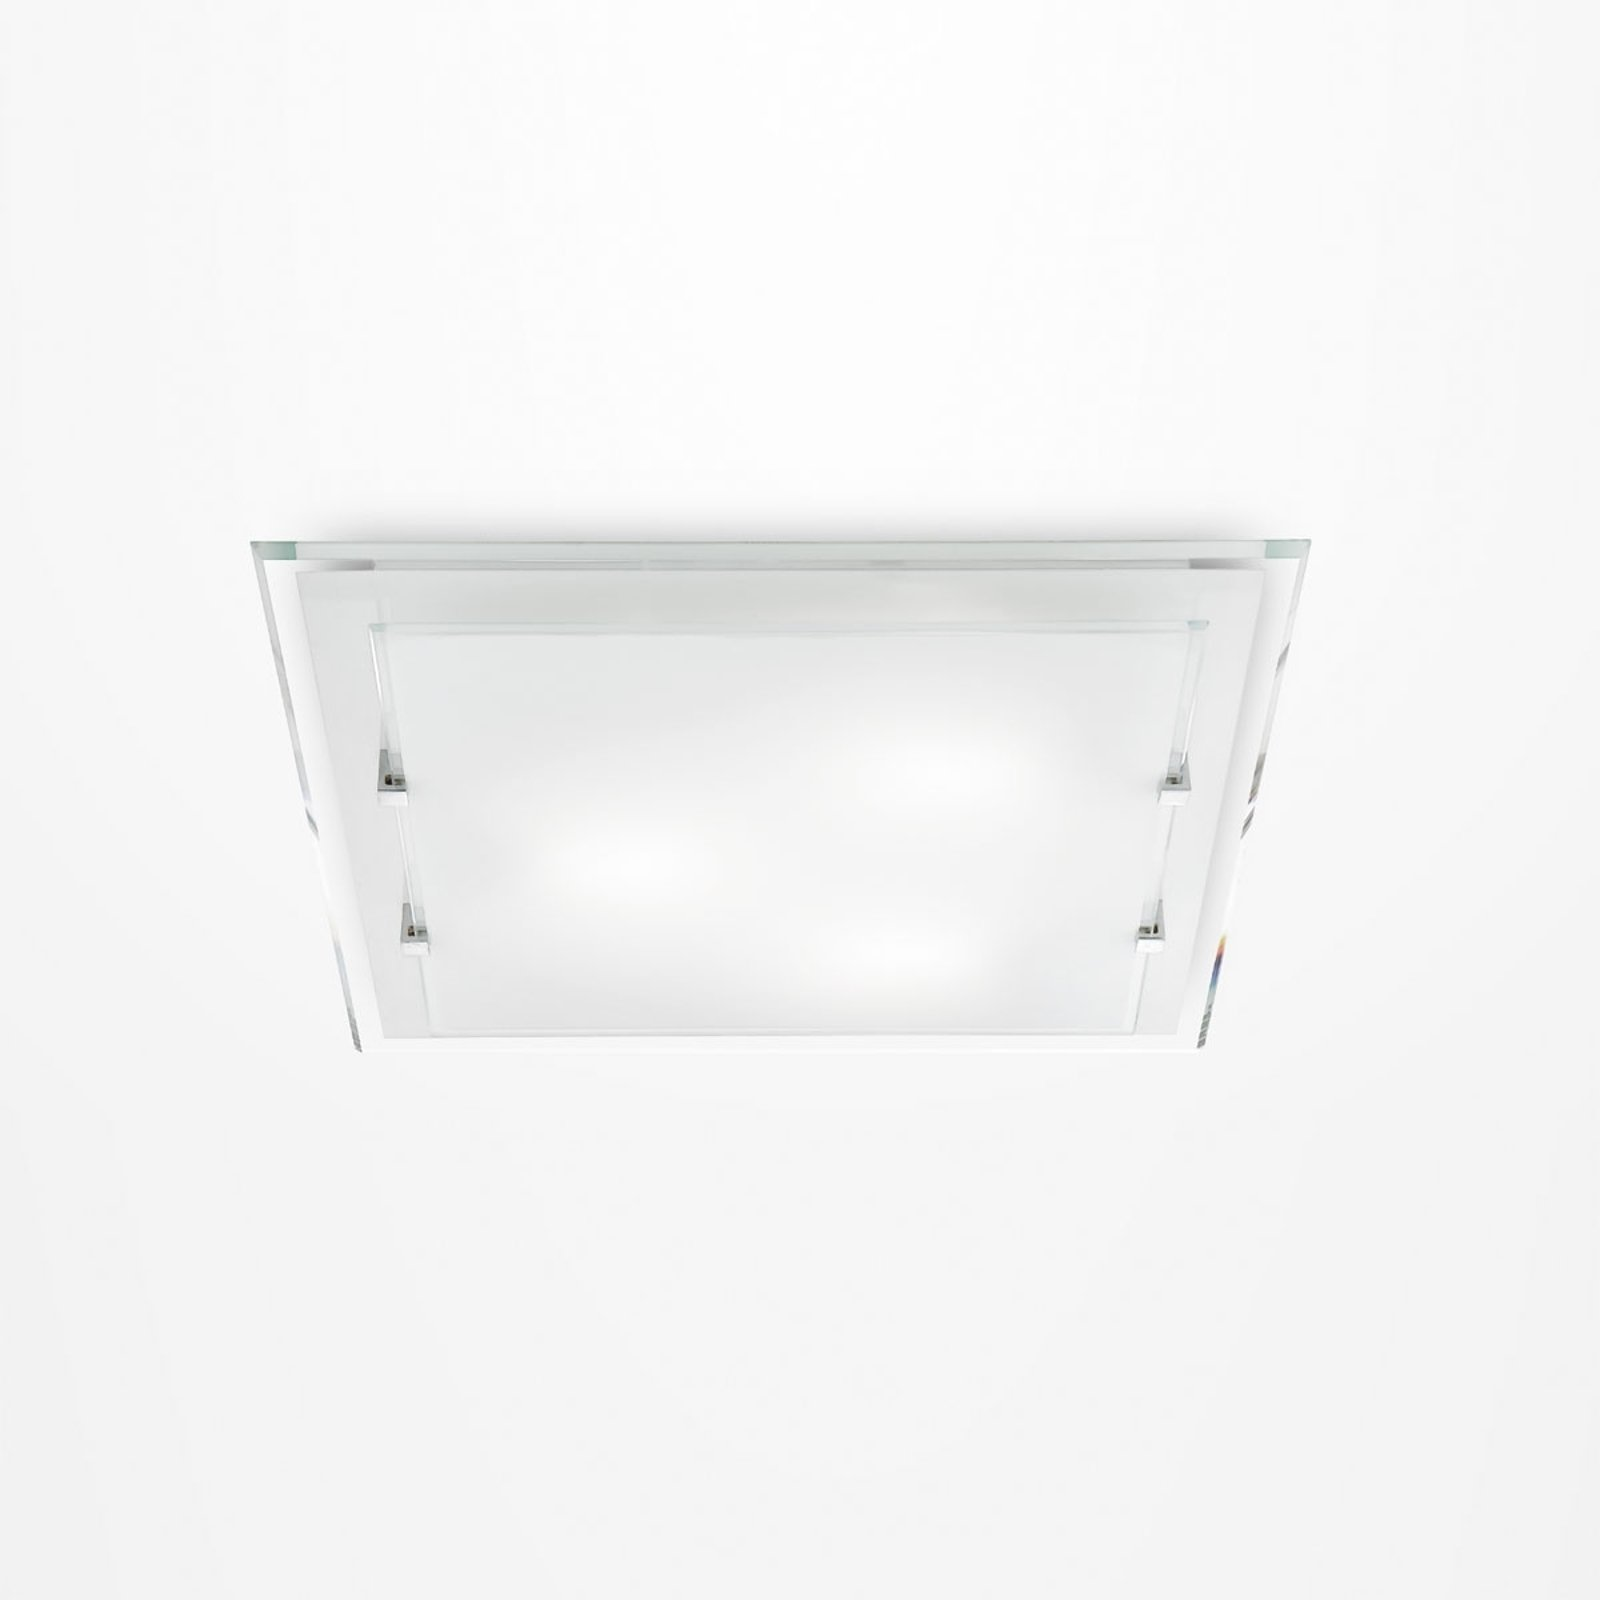 Kantet taklampe Victoria, 30 cm x 30 cm